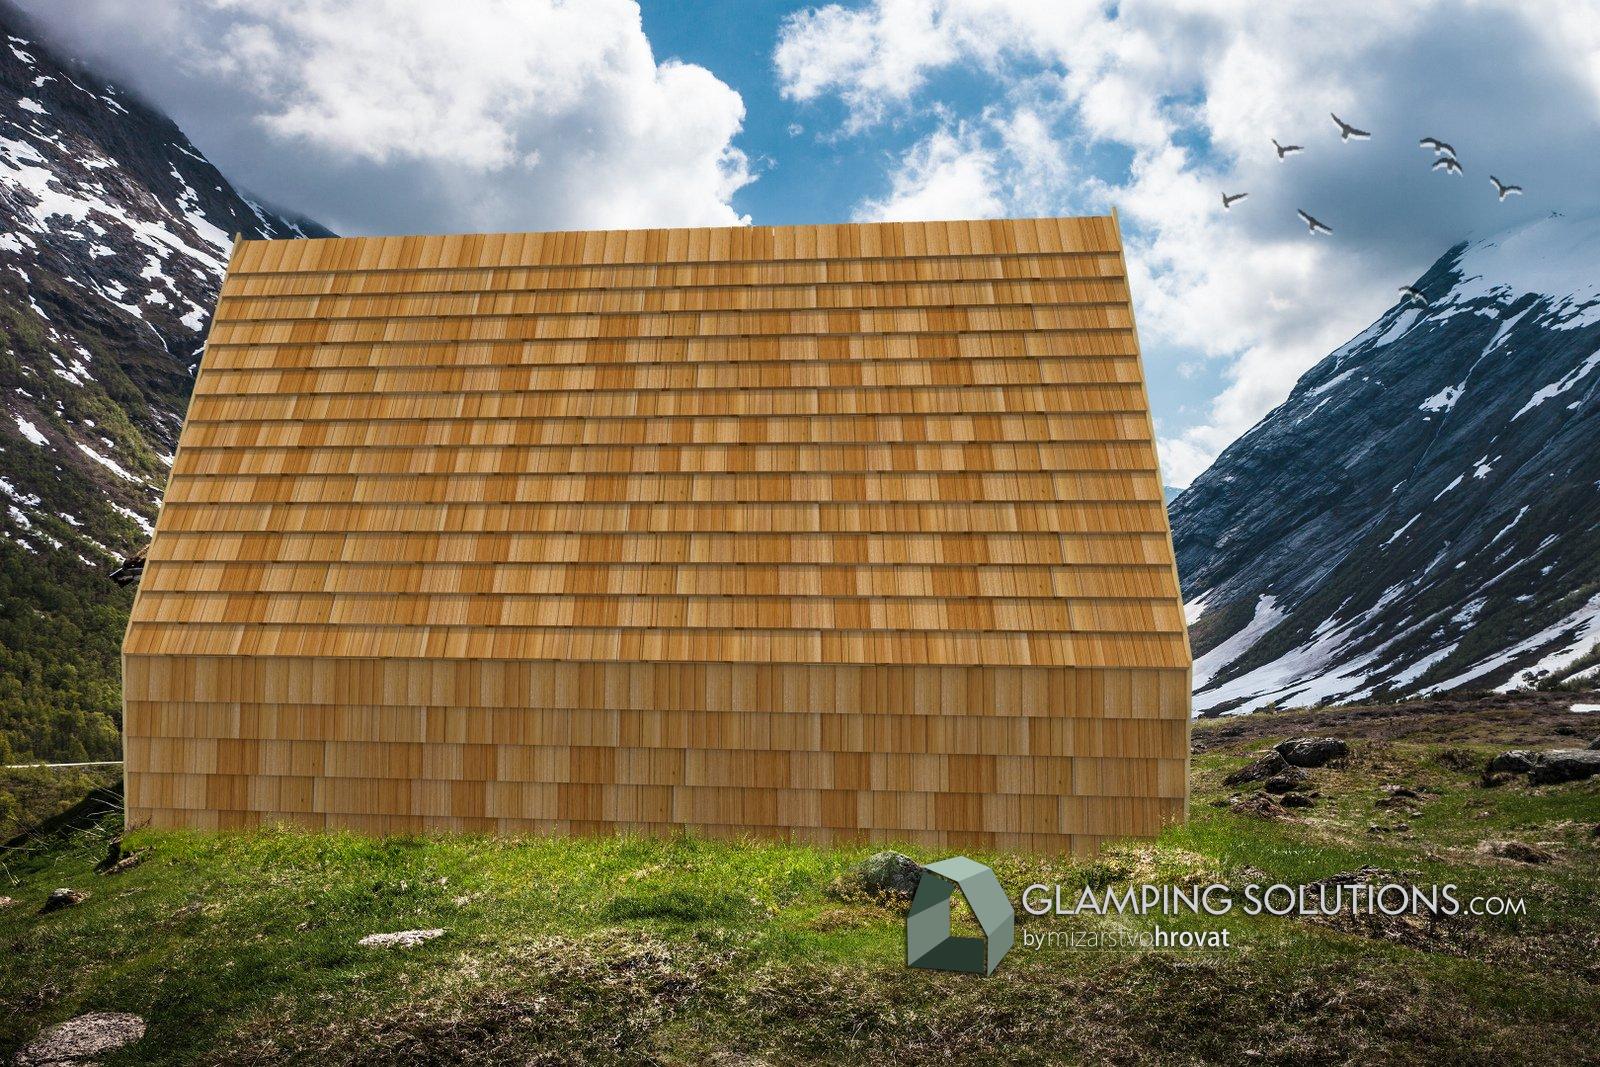 Glamping-Solutions-Alpine-Hut-3